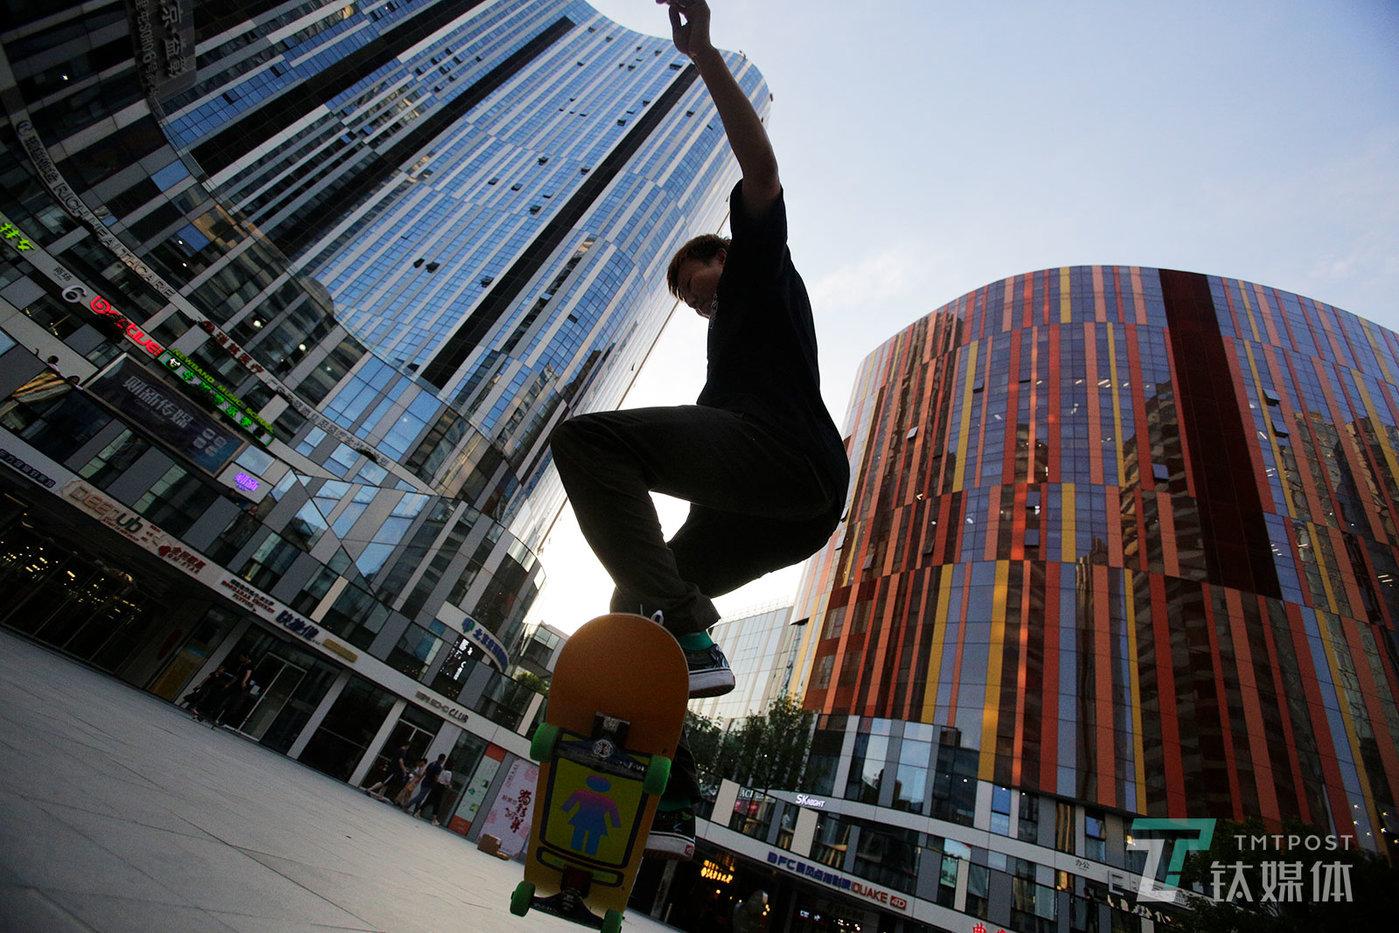 【Skate boy】6月14日,北京三里屯SOHO下沉广场的滑板运动爱好者。